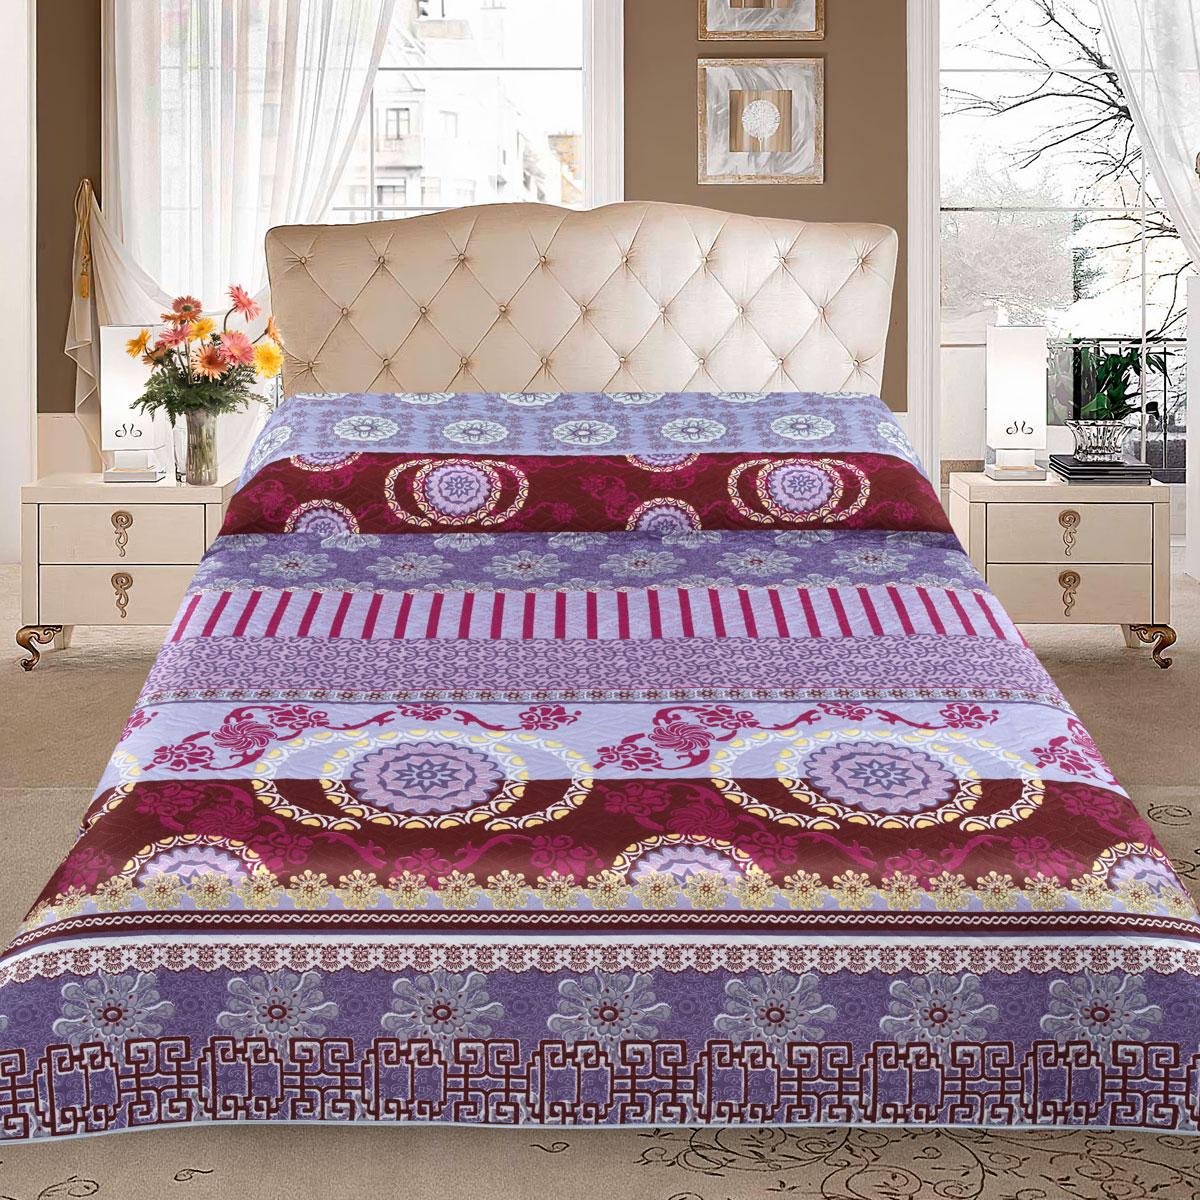 Покрывало Letto, цвет: фиолетовый, 210 x 240 см. pp25